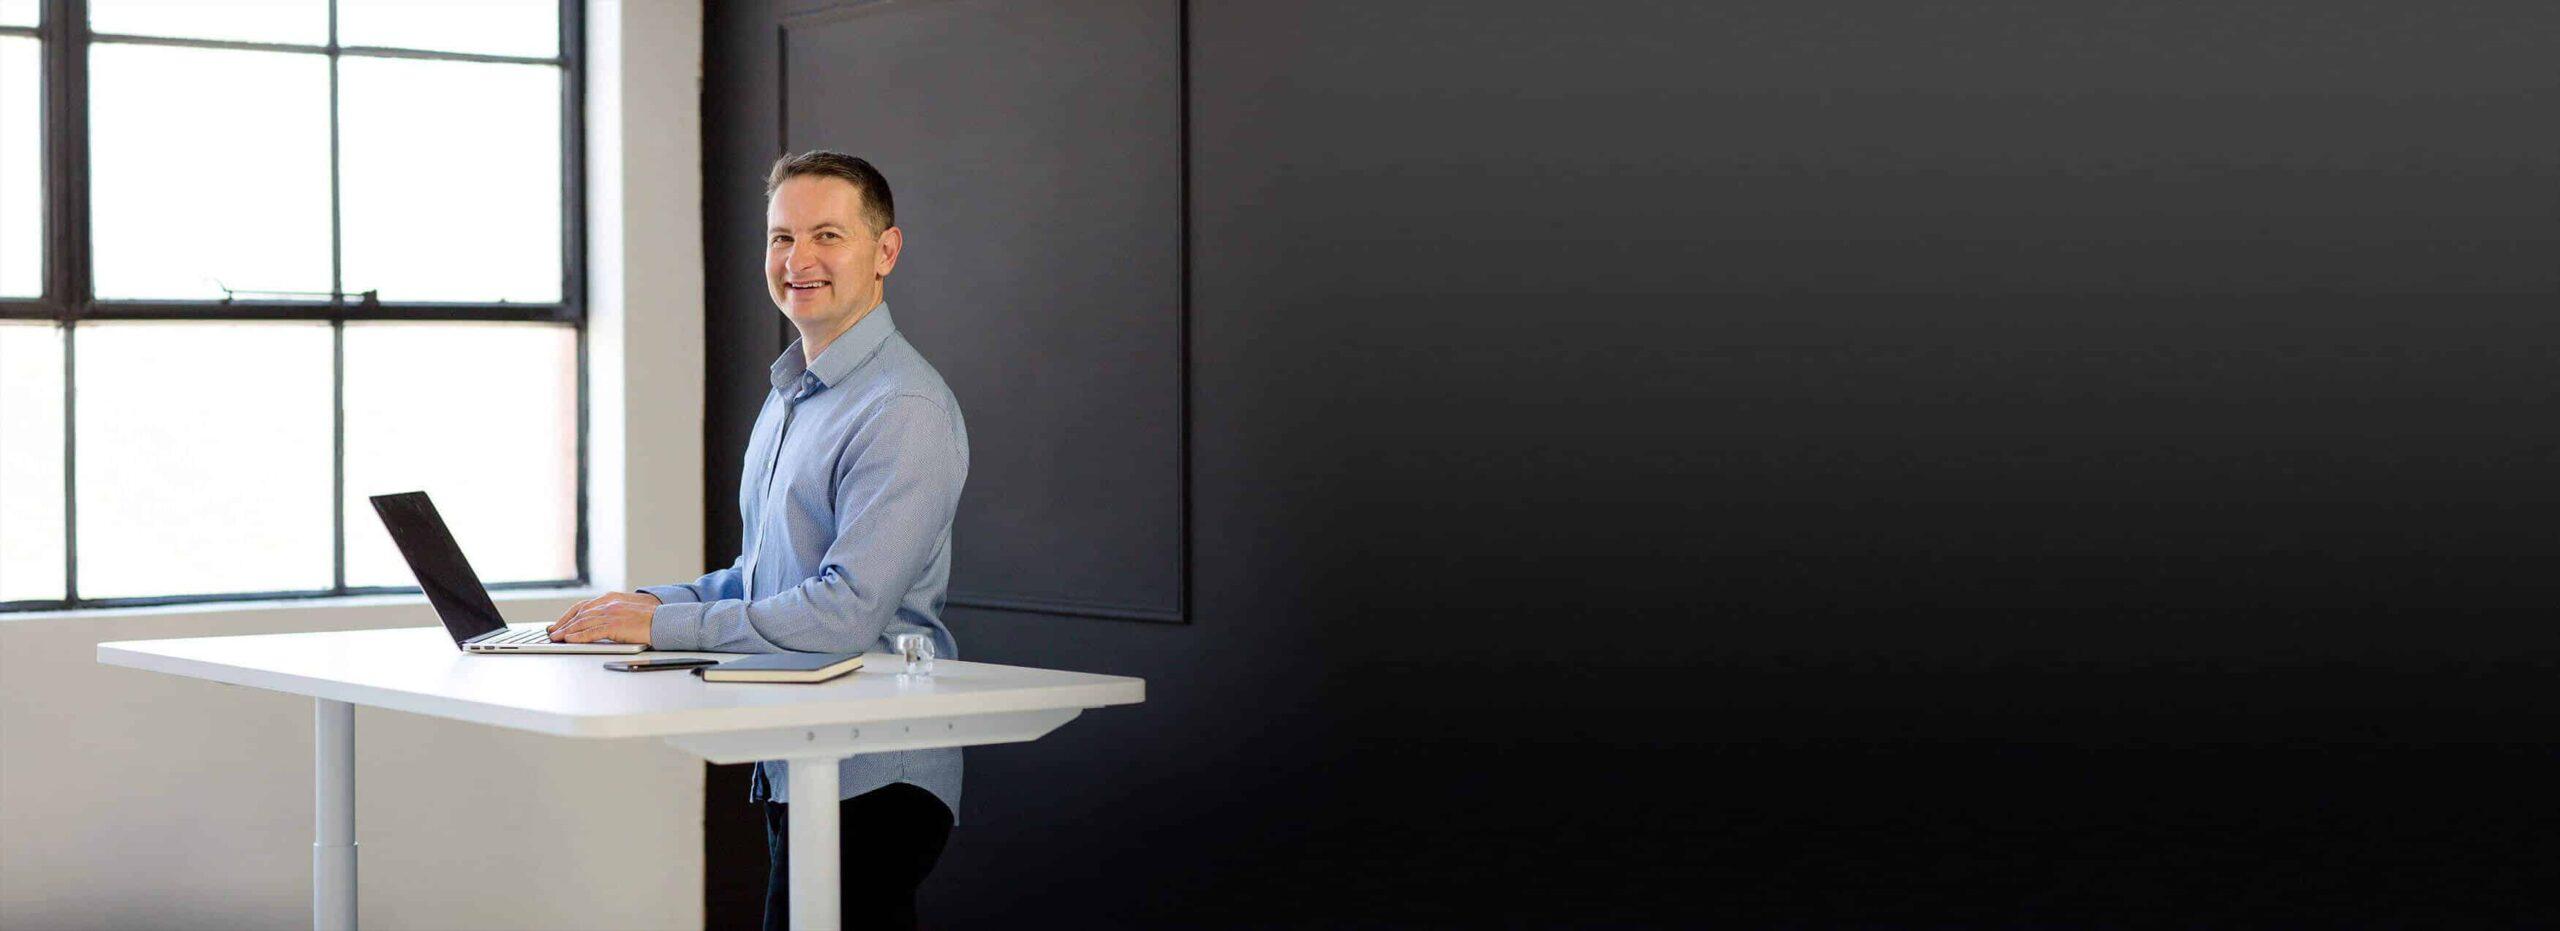 FAQ about Standing desks Australia